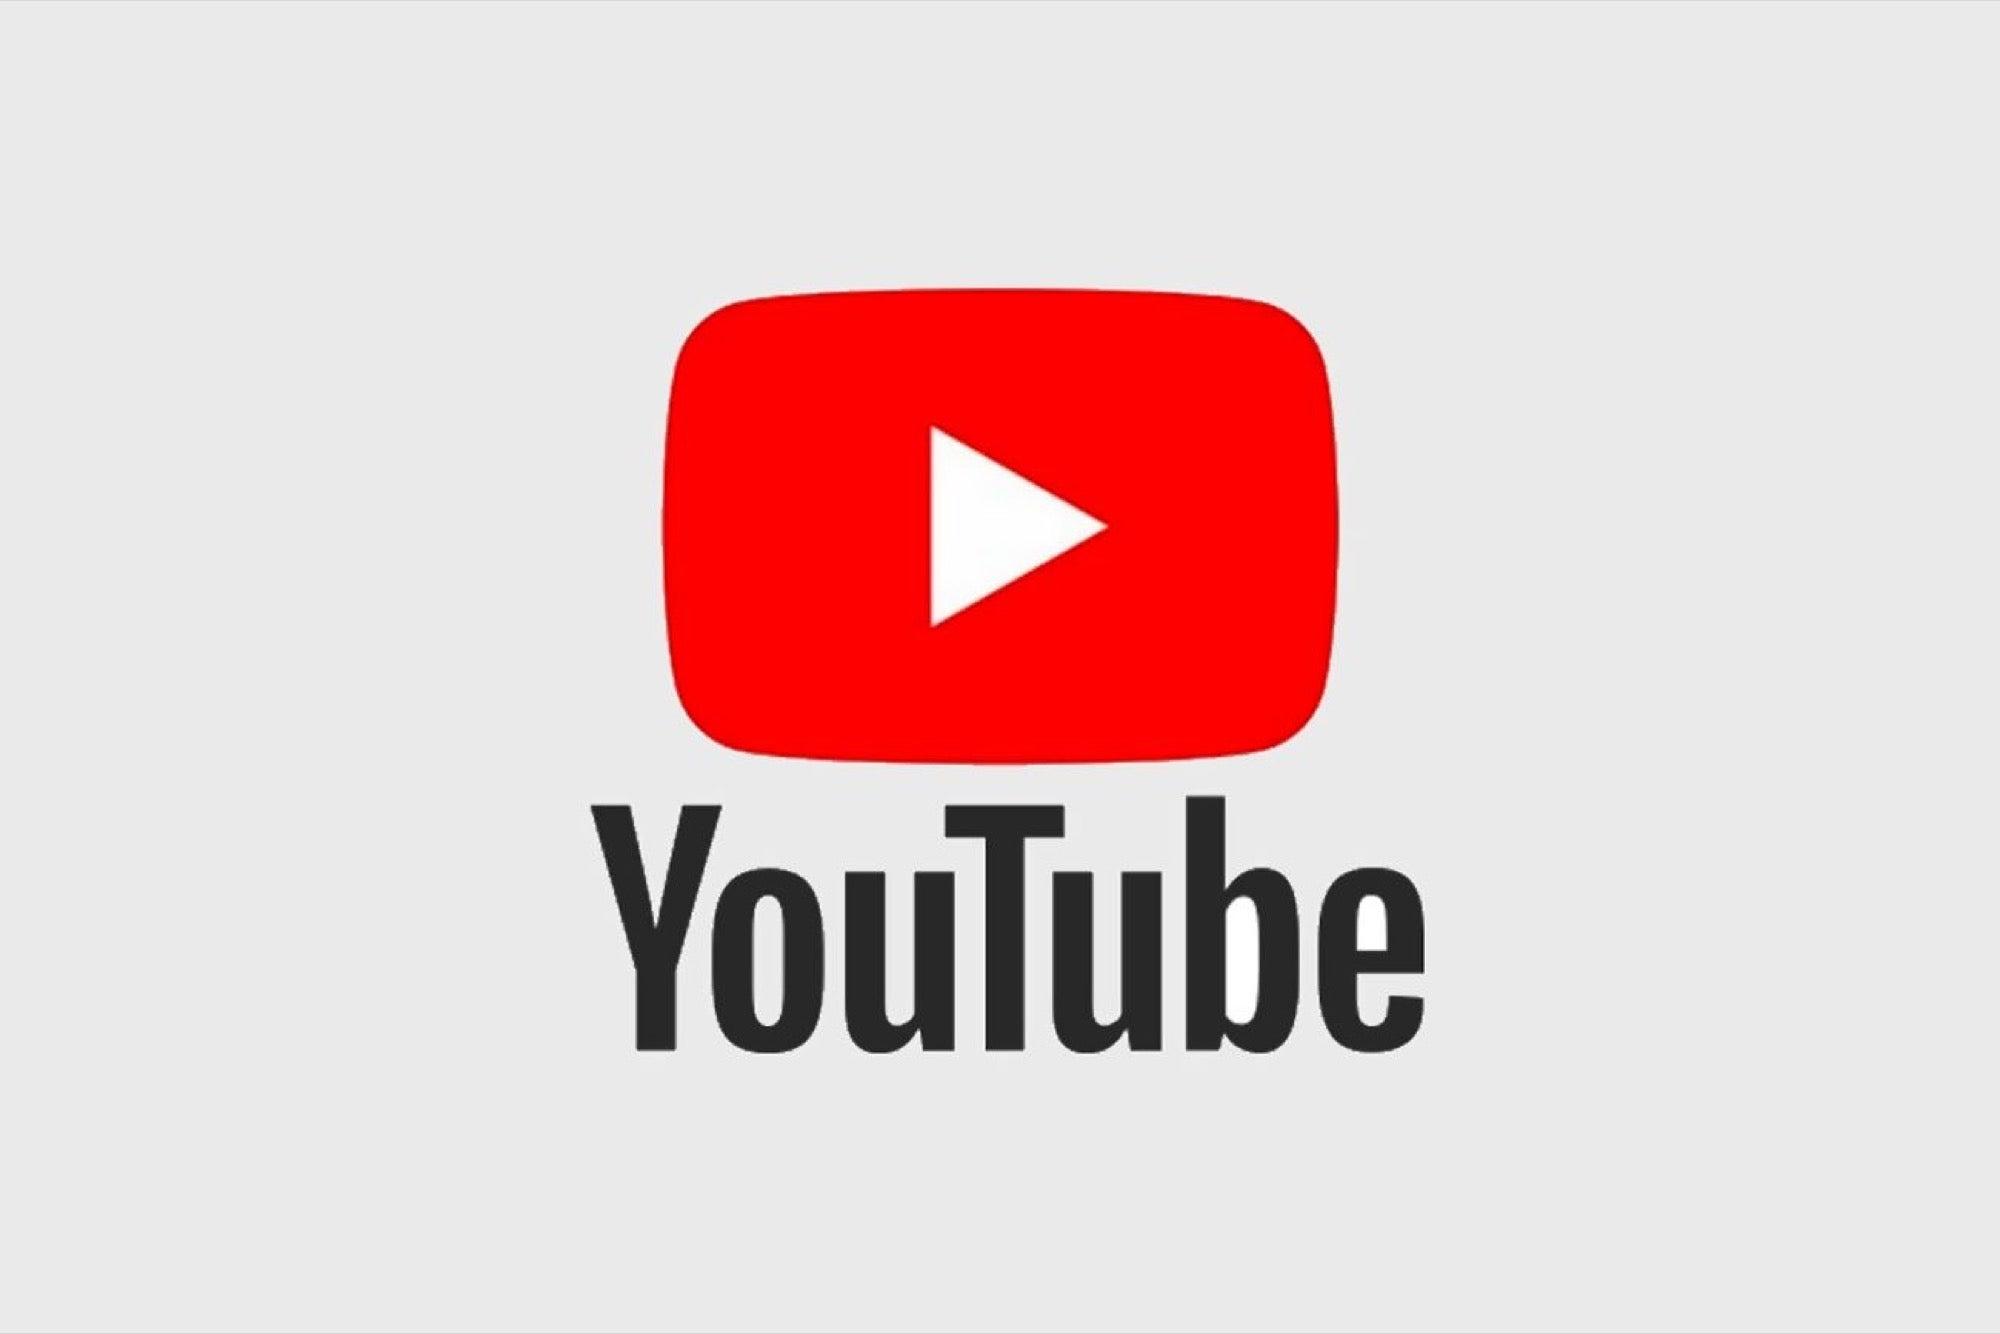 20180117155526-youtube